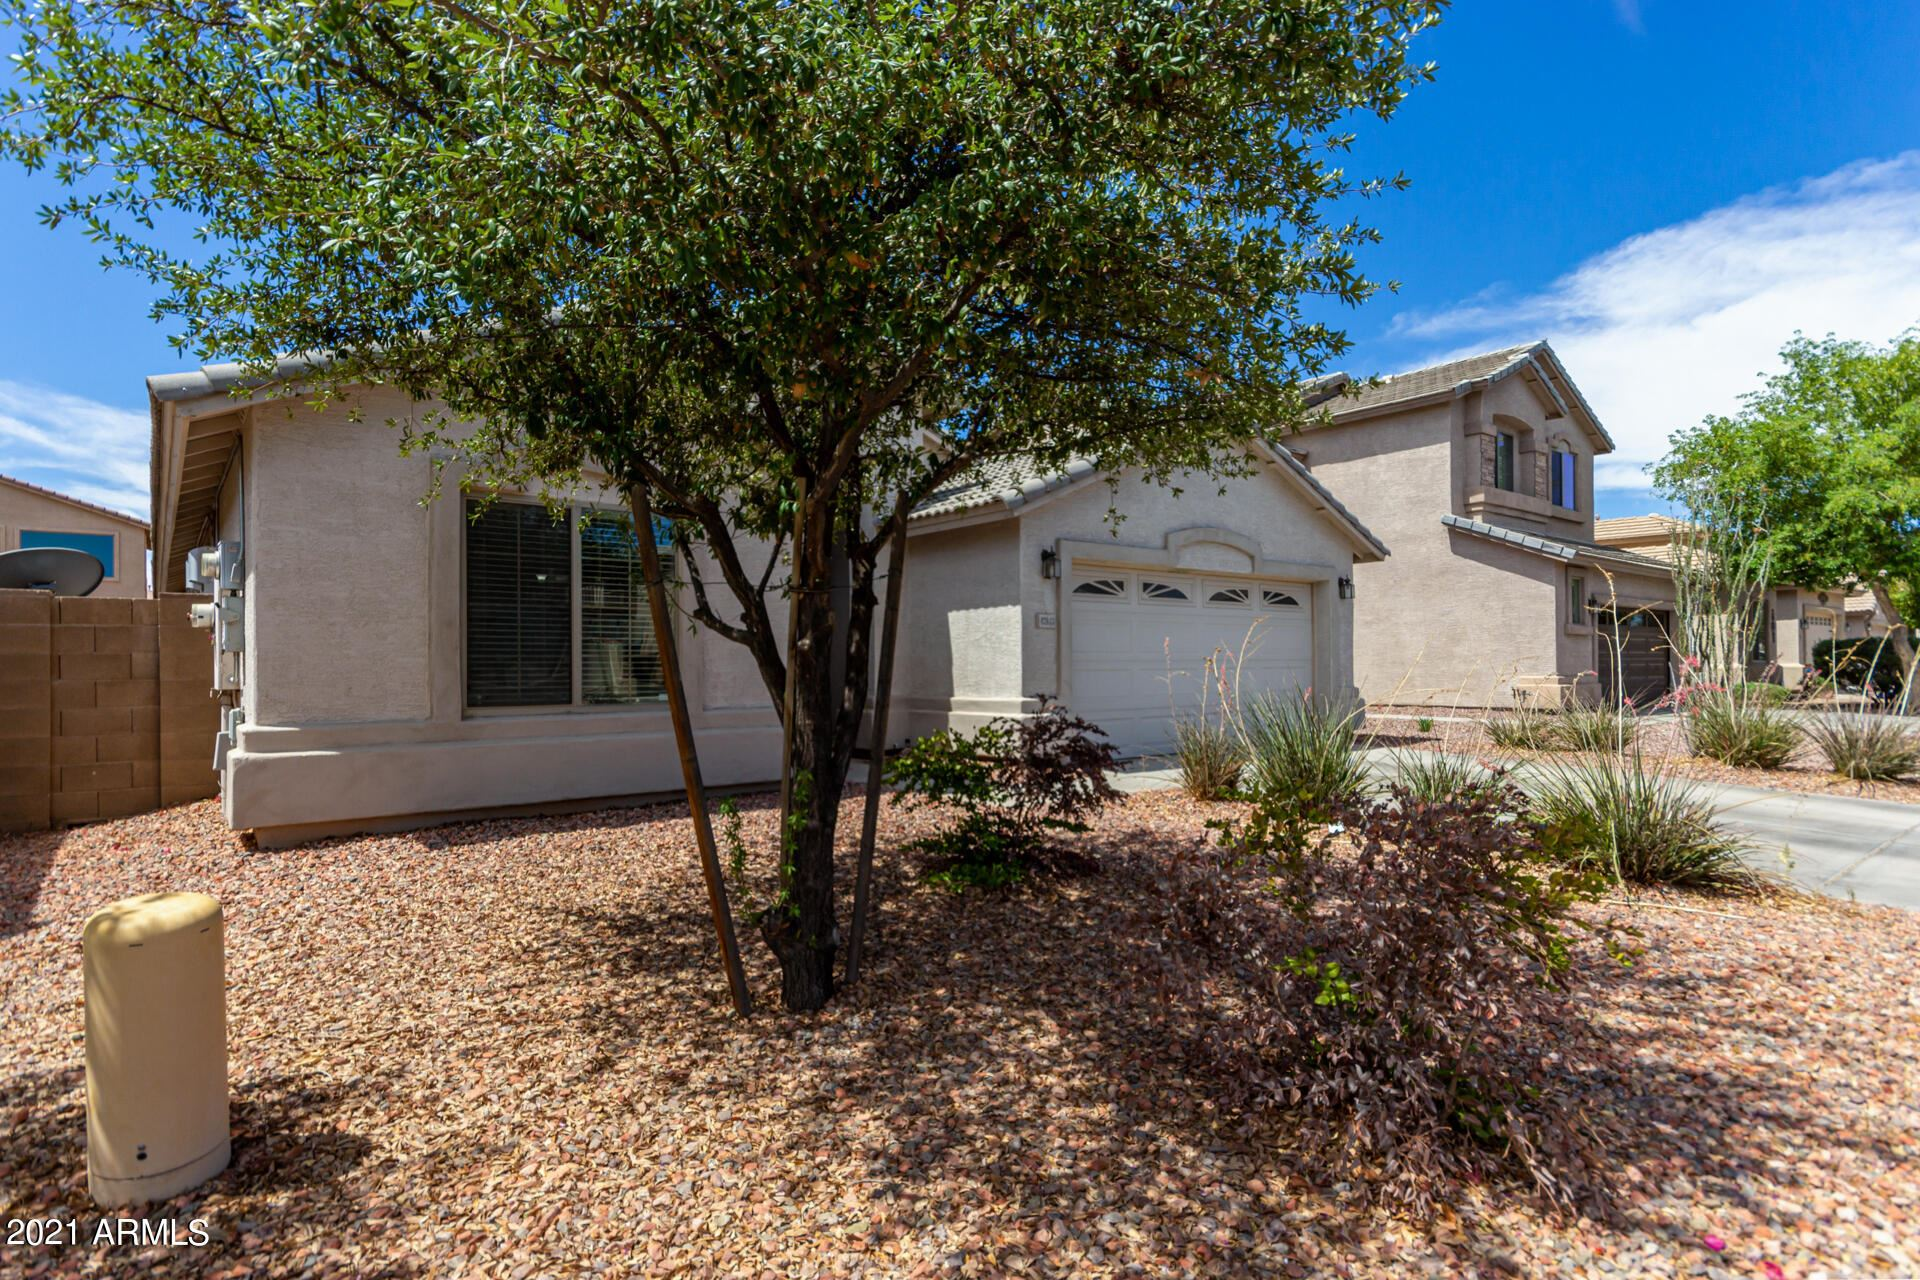 Photo of 43843 W ROTH Road, Maricopa, AZ 85138 (MLS # 6249264)